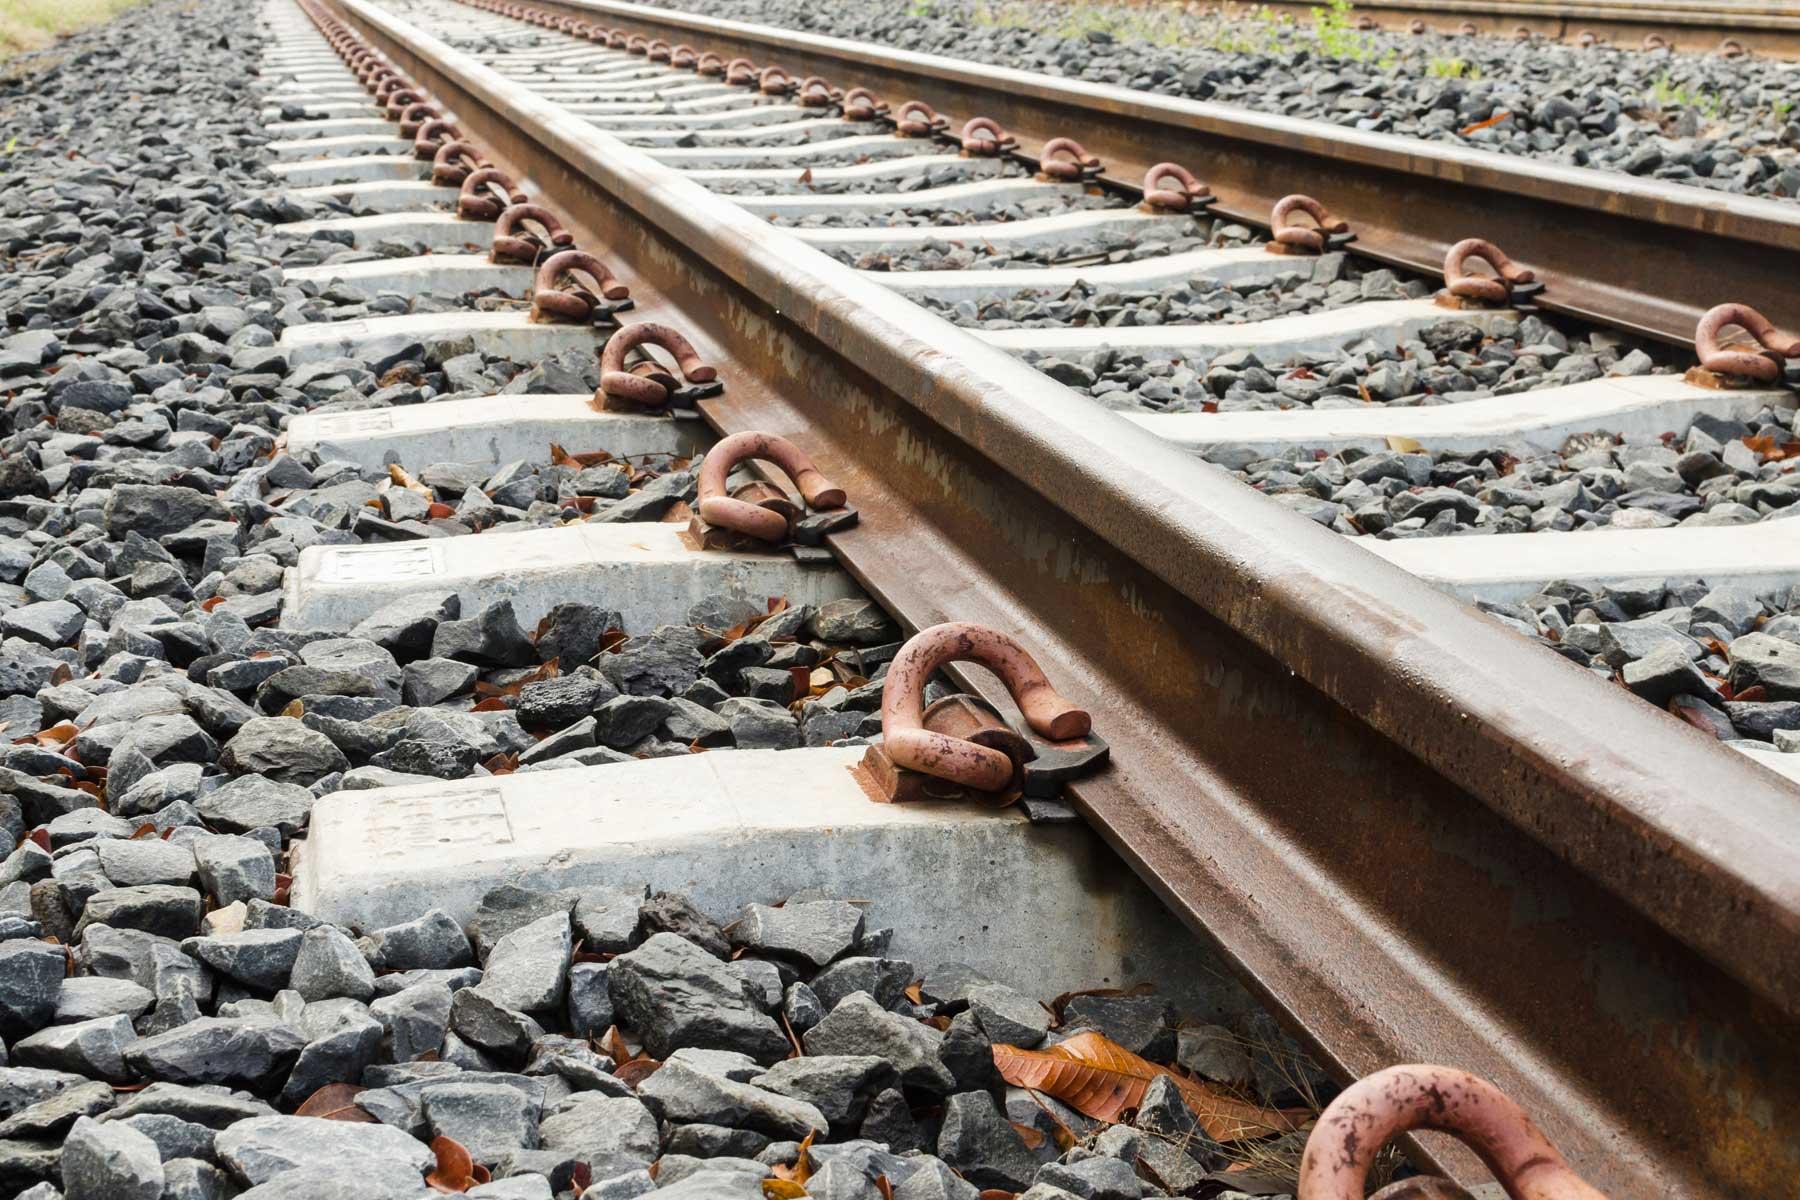 Northern-Sydney-Freigh-Corridor